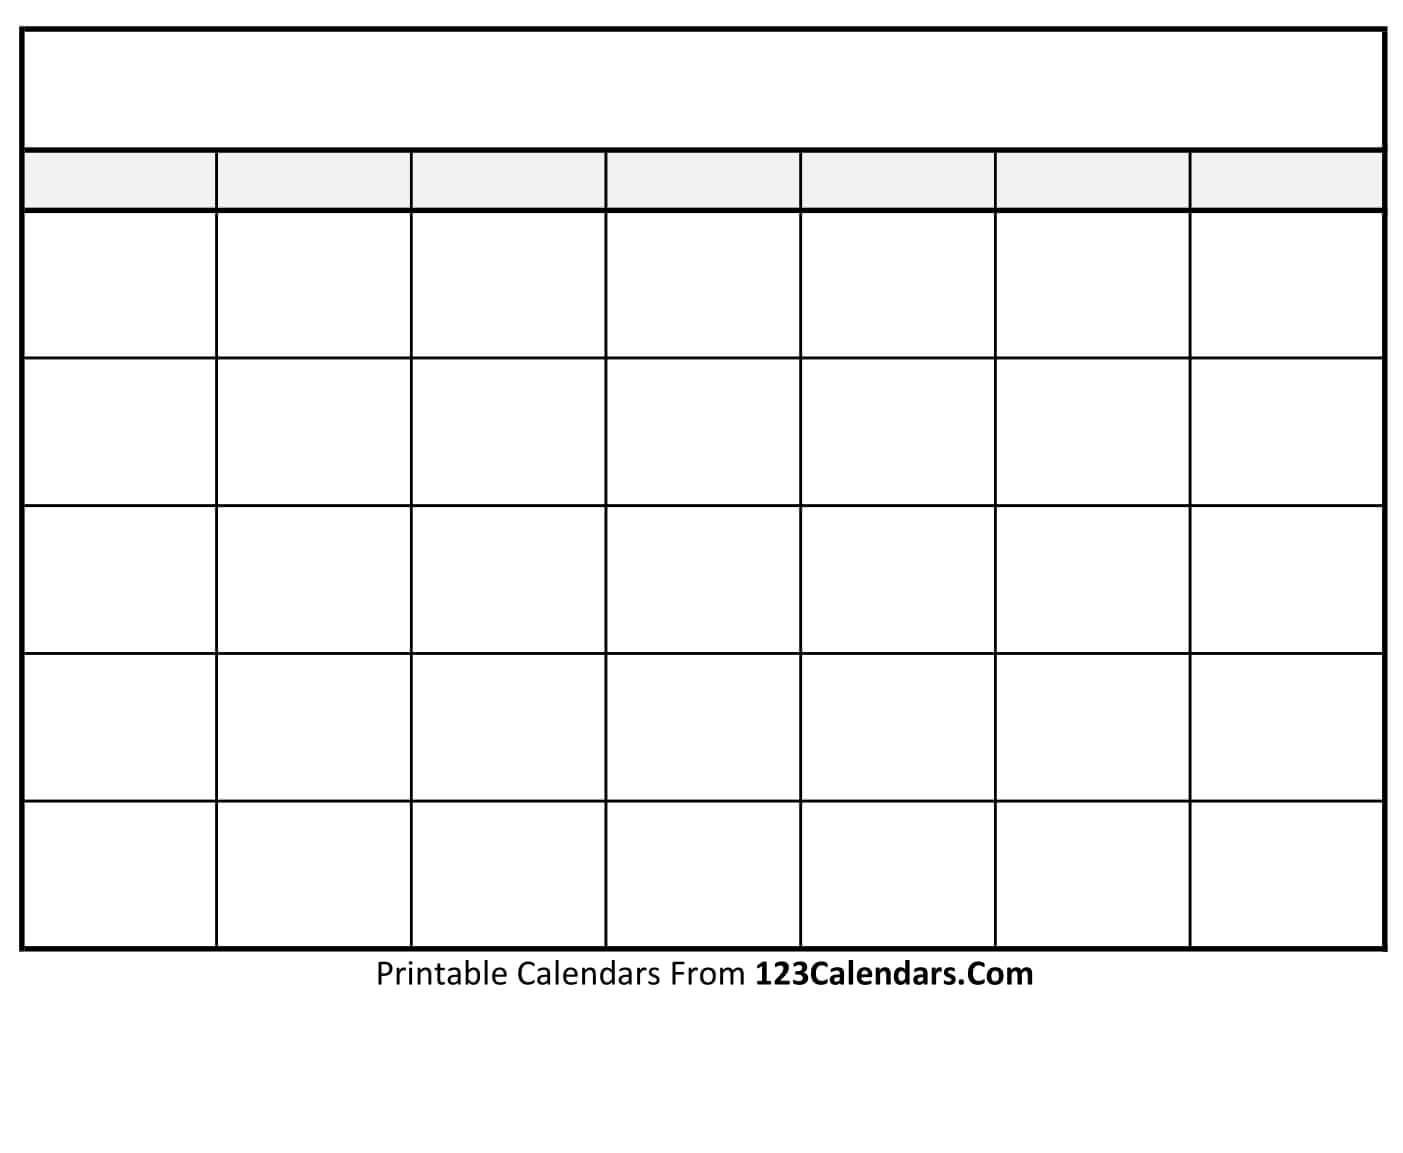 Free Printable Blank Calendar   123Calendars with Blank Calendar Template With Lines